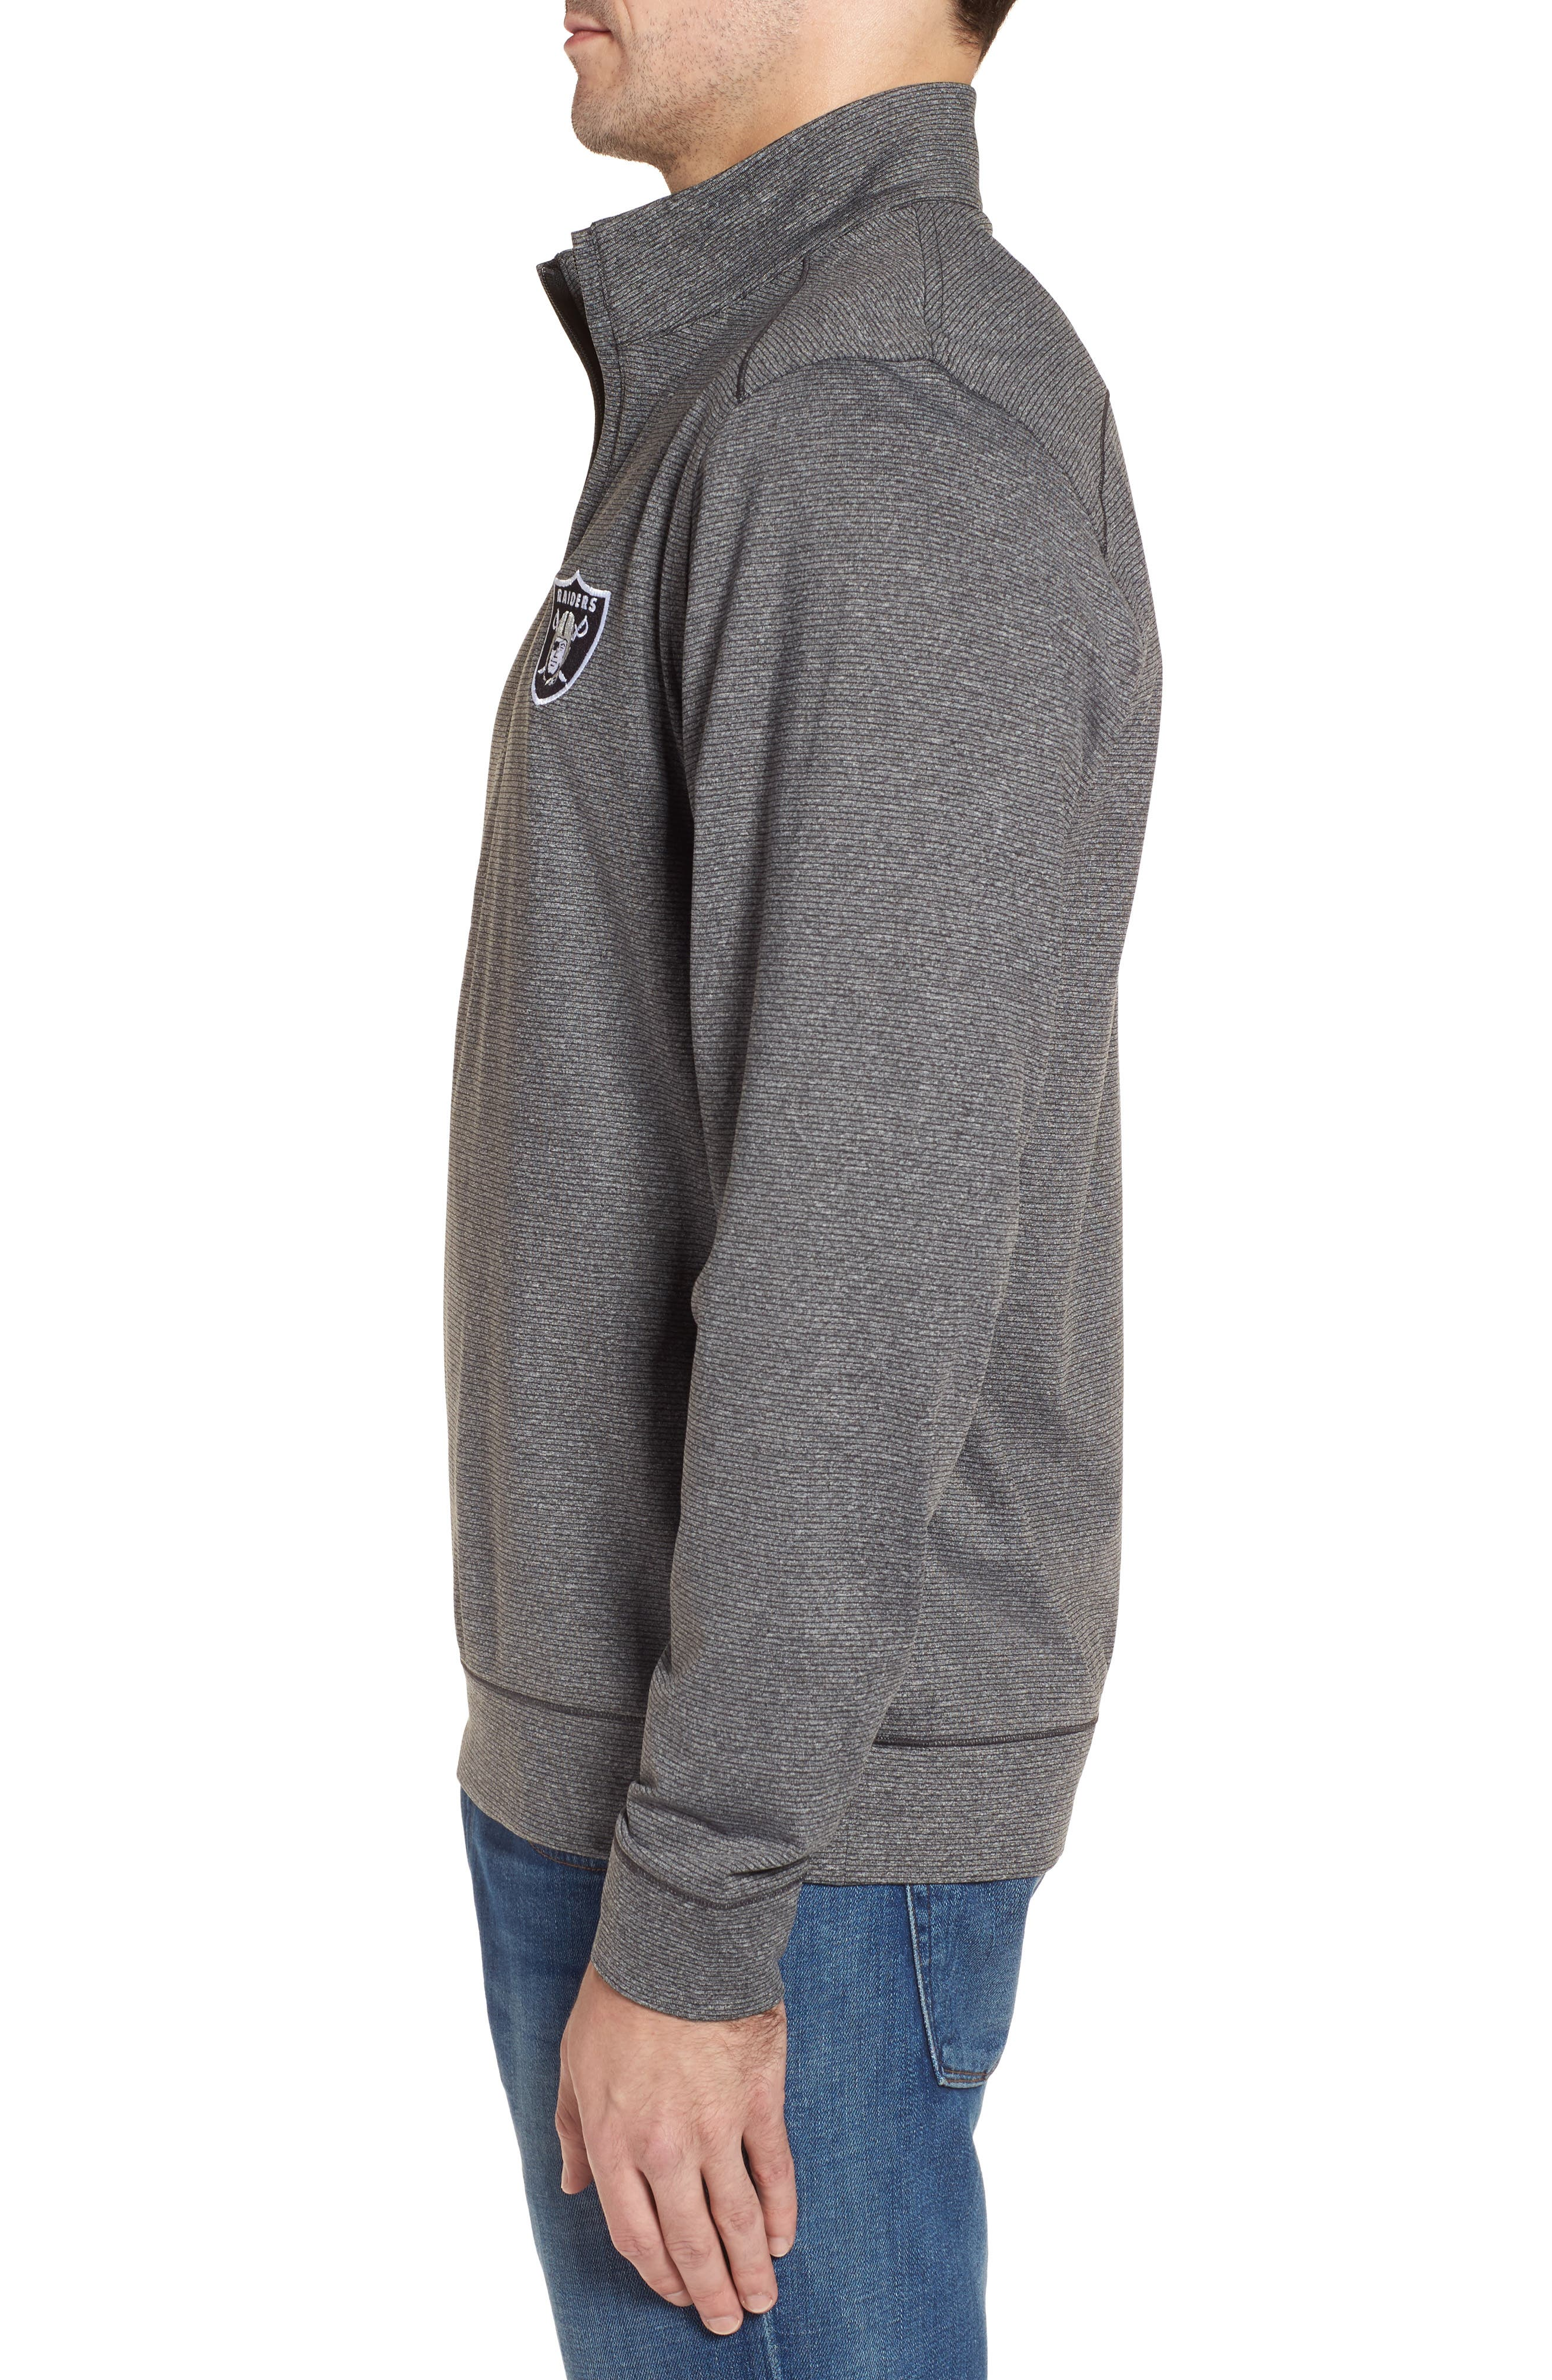 Shoreline - Oakland Raiders Half Zip Pullover,                             Alternate thumbnail 3, color,                             Charcoal Heather